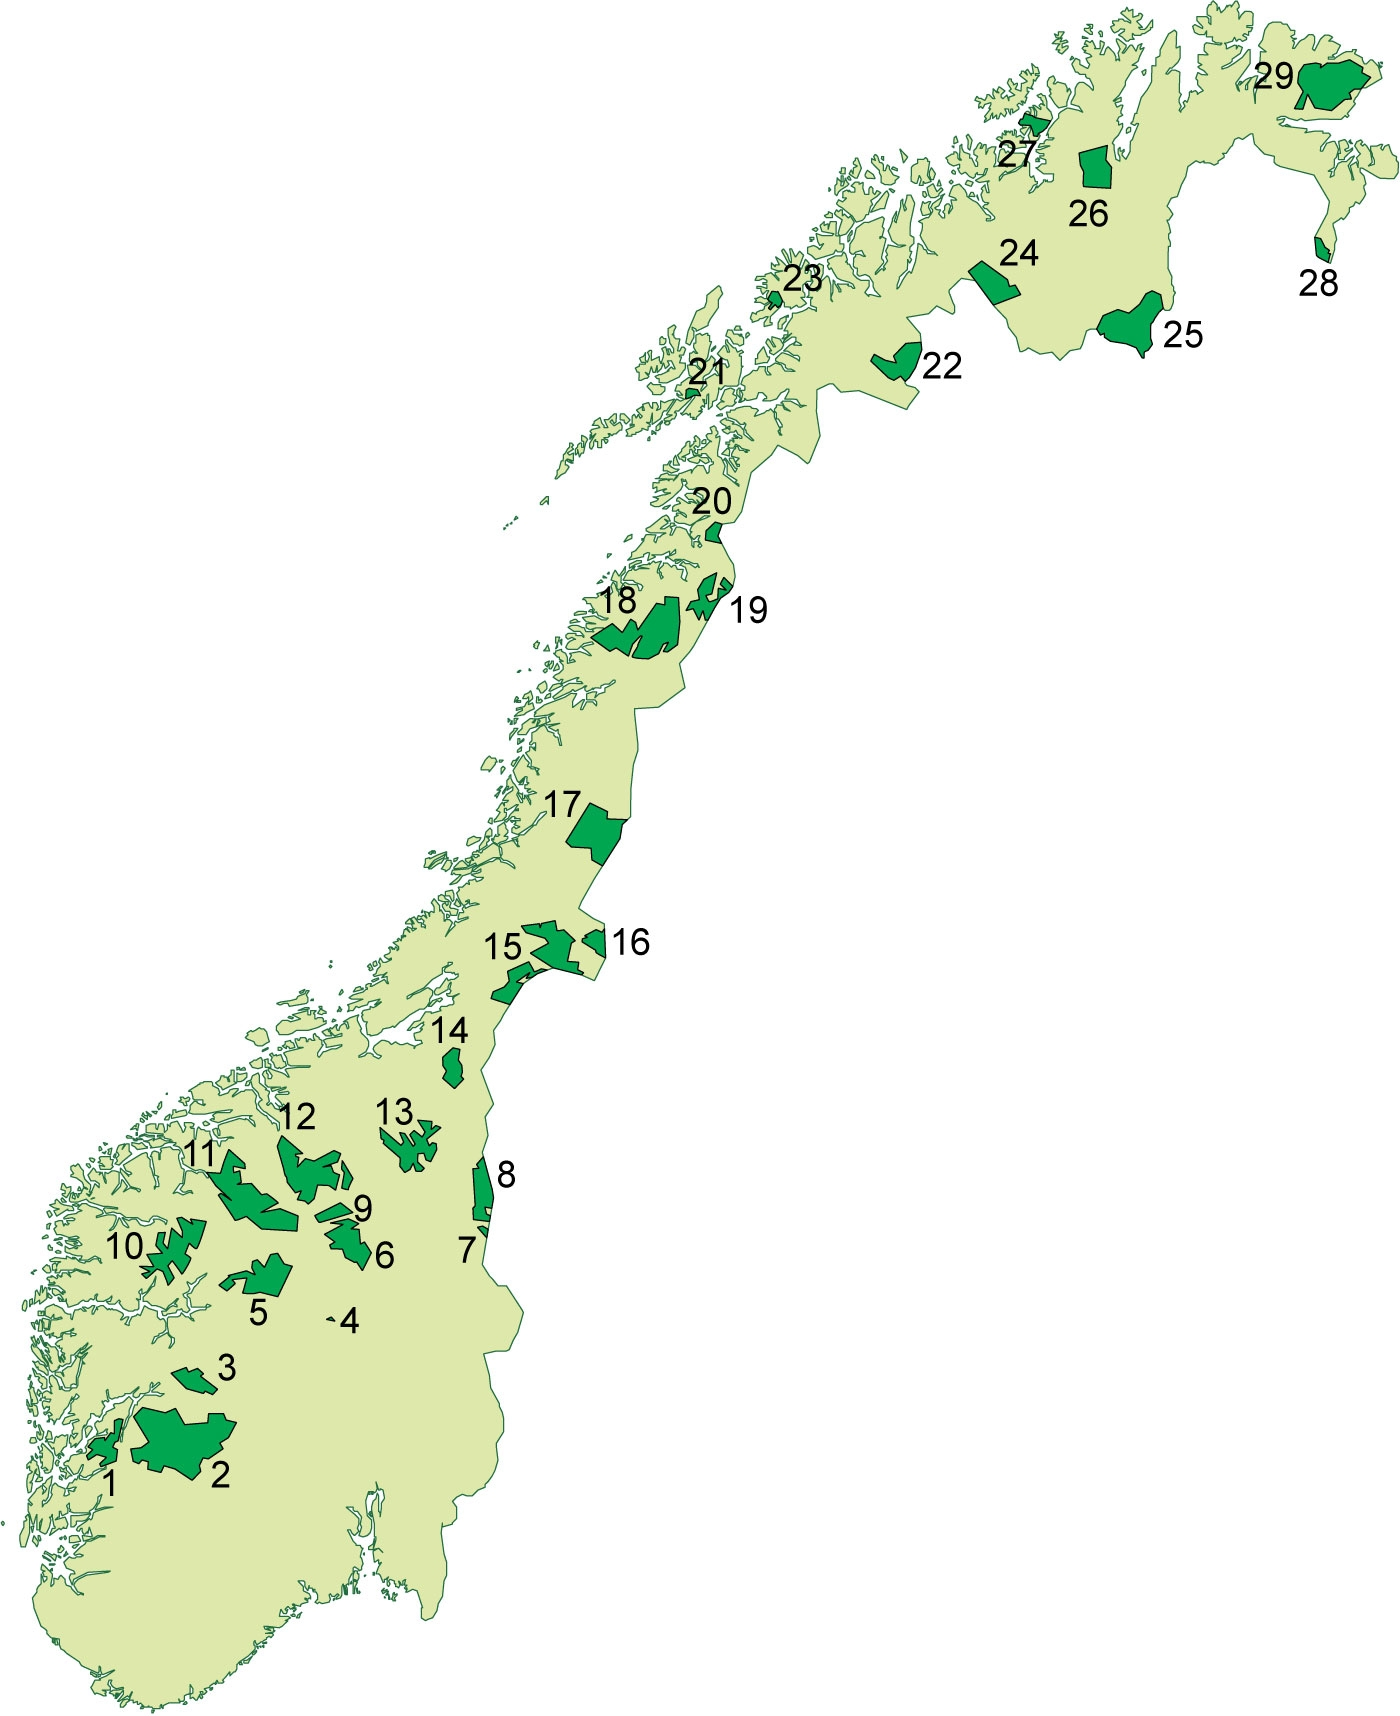 kart over nasjonalparker i norge Fil:Nasjonalparker Norge. – Wikipedia